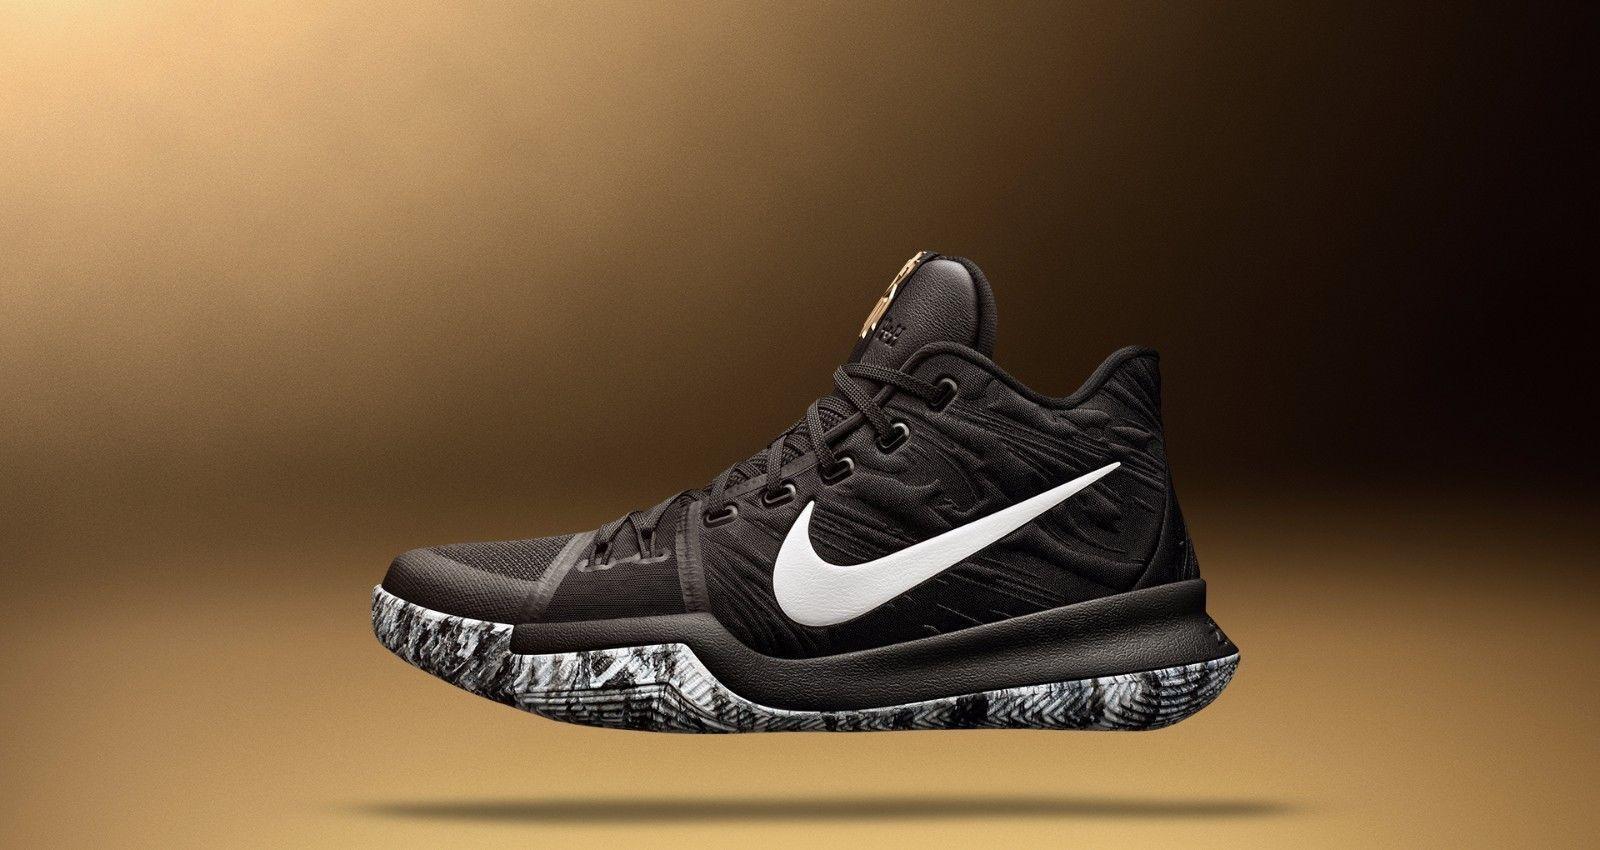 Nike Kyrie 3 BHM Black White Gold Comfortable Seasonal price cuts, discount benefits